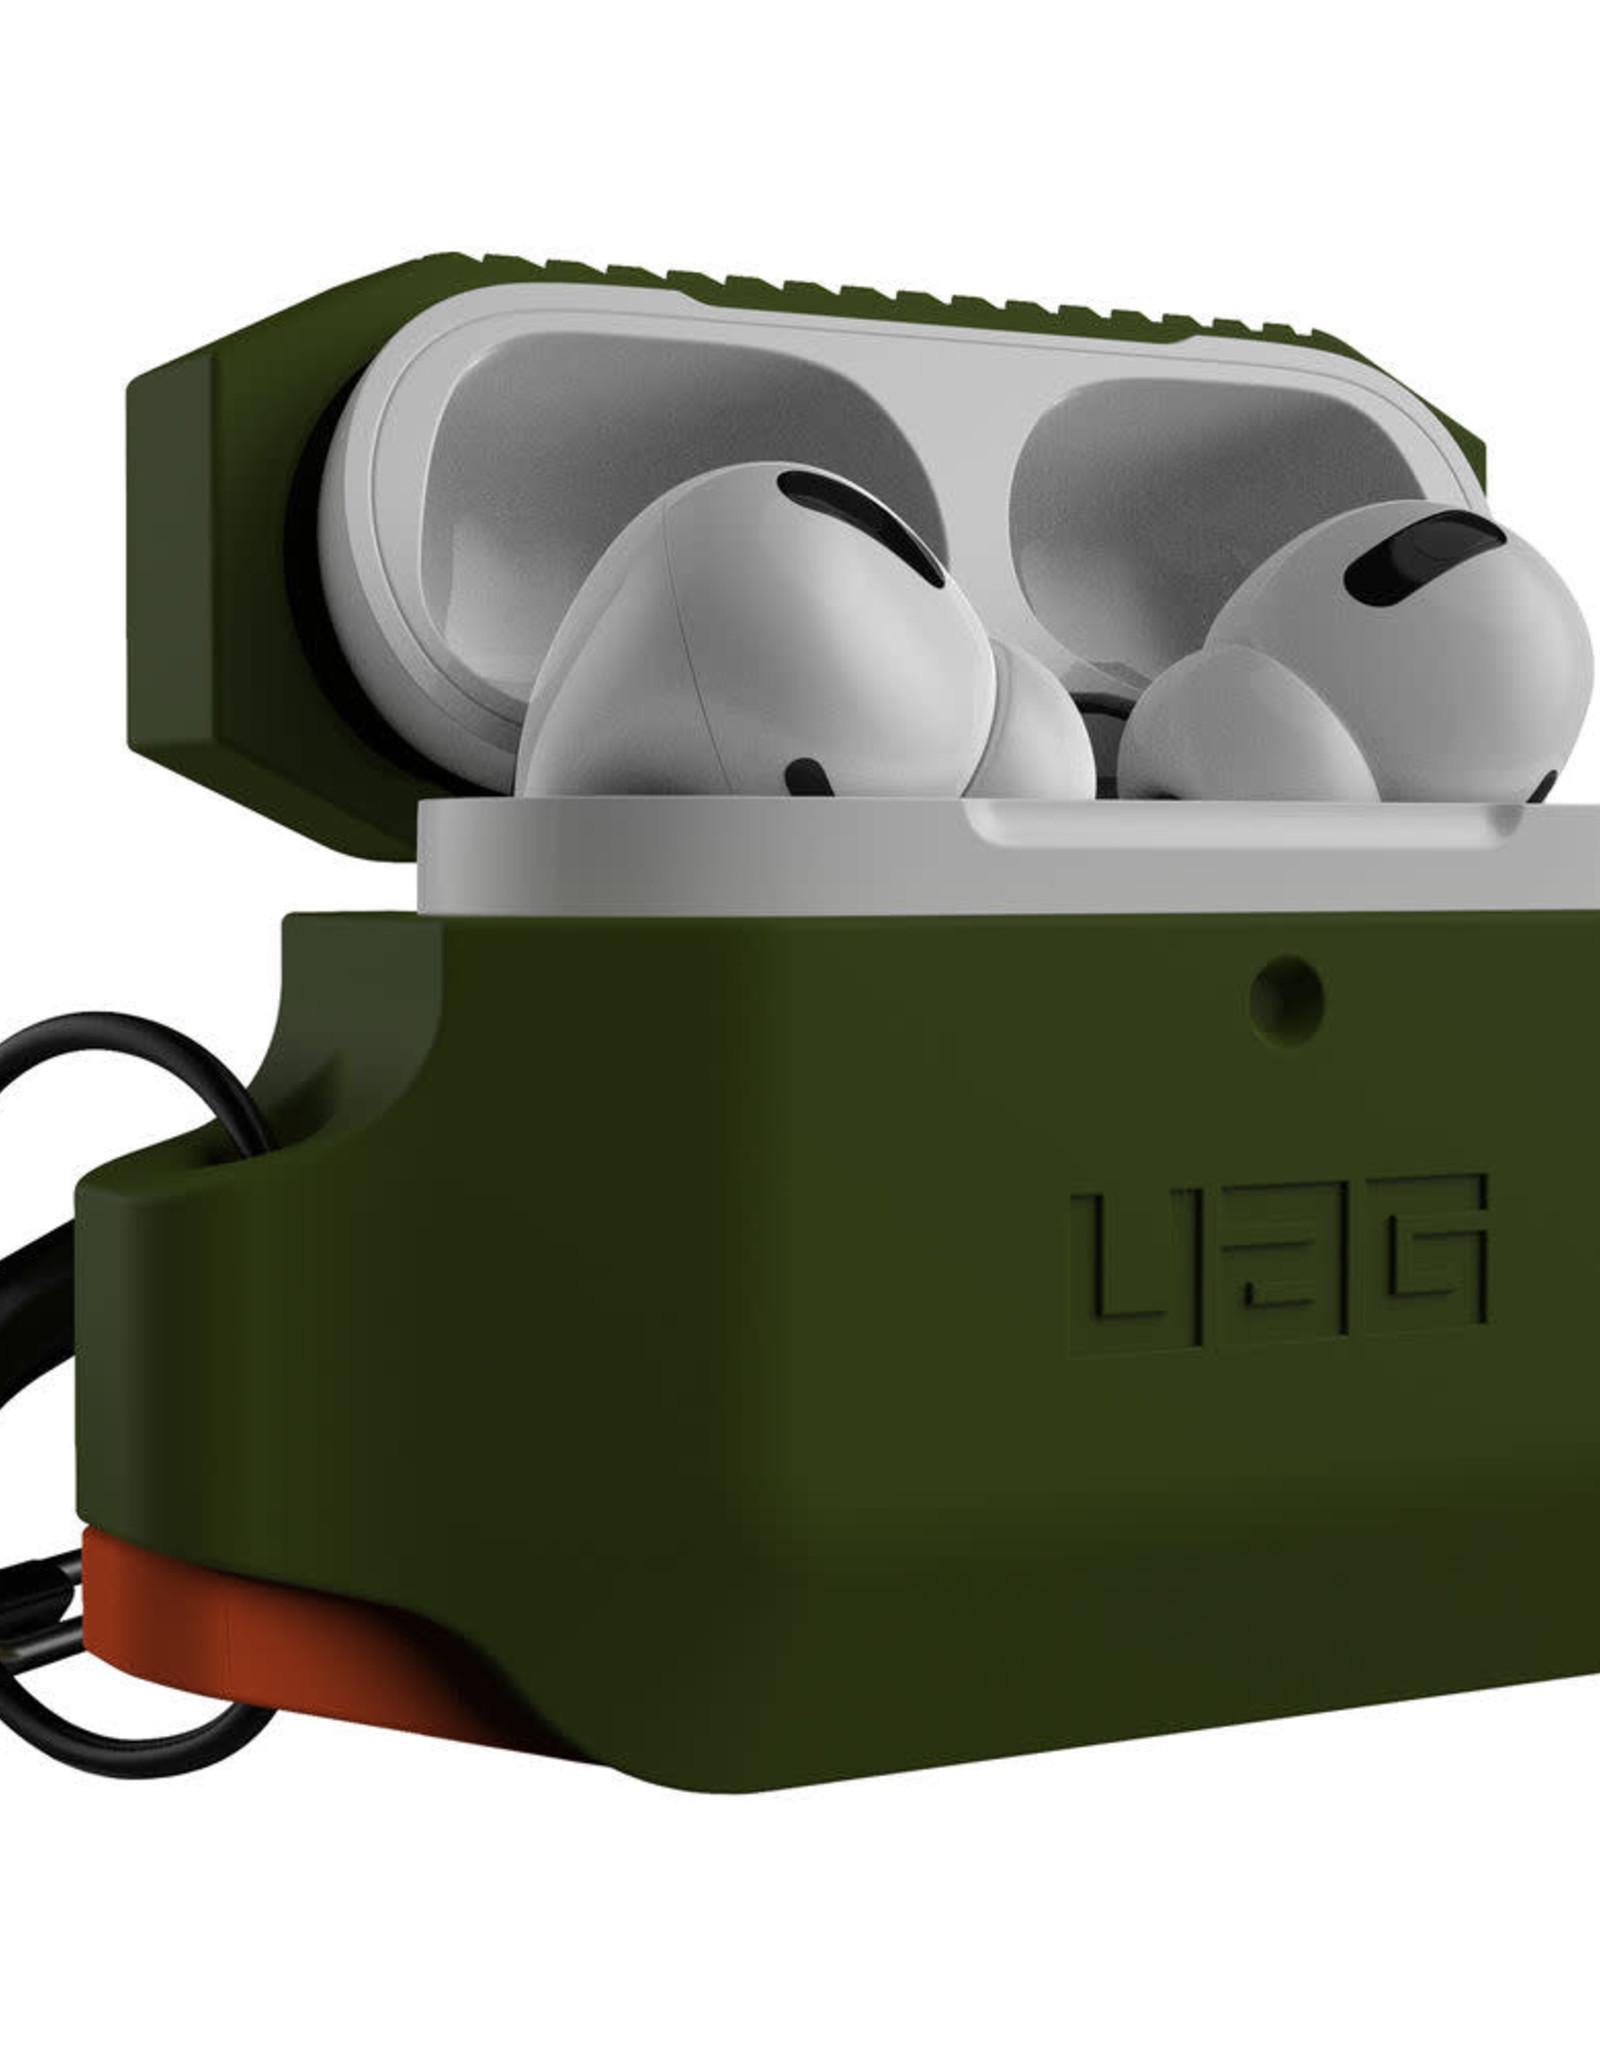 UAG UAG - Silicone Case Olive Drab/Orange for Apple AirPods Pro 120-2735